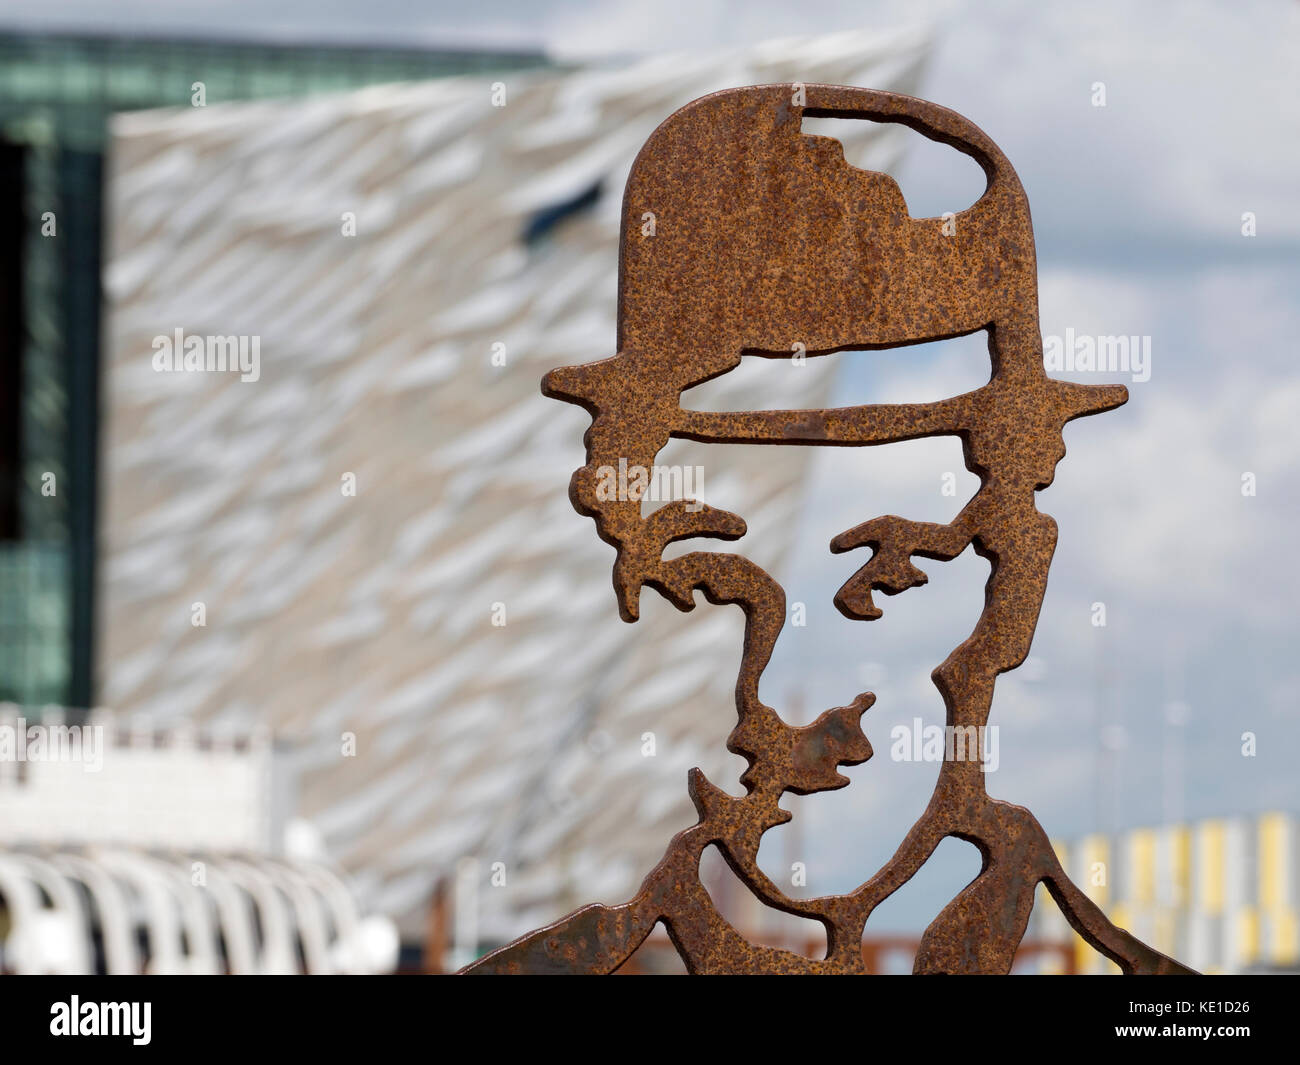 Statue Of Charlie Chaplin in Belfast's Titanic Quarter 2 - Stock Image